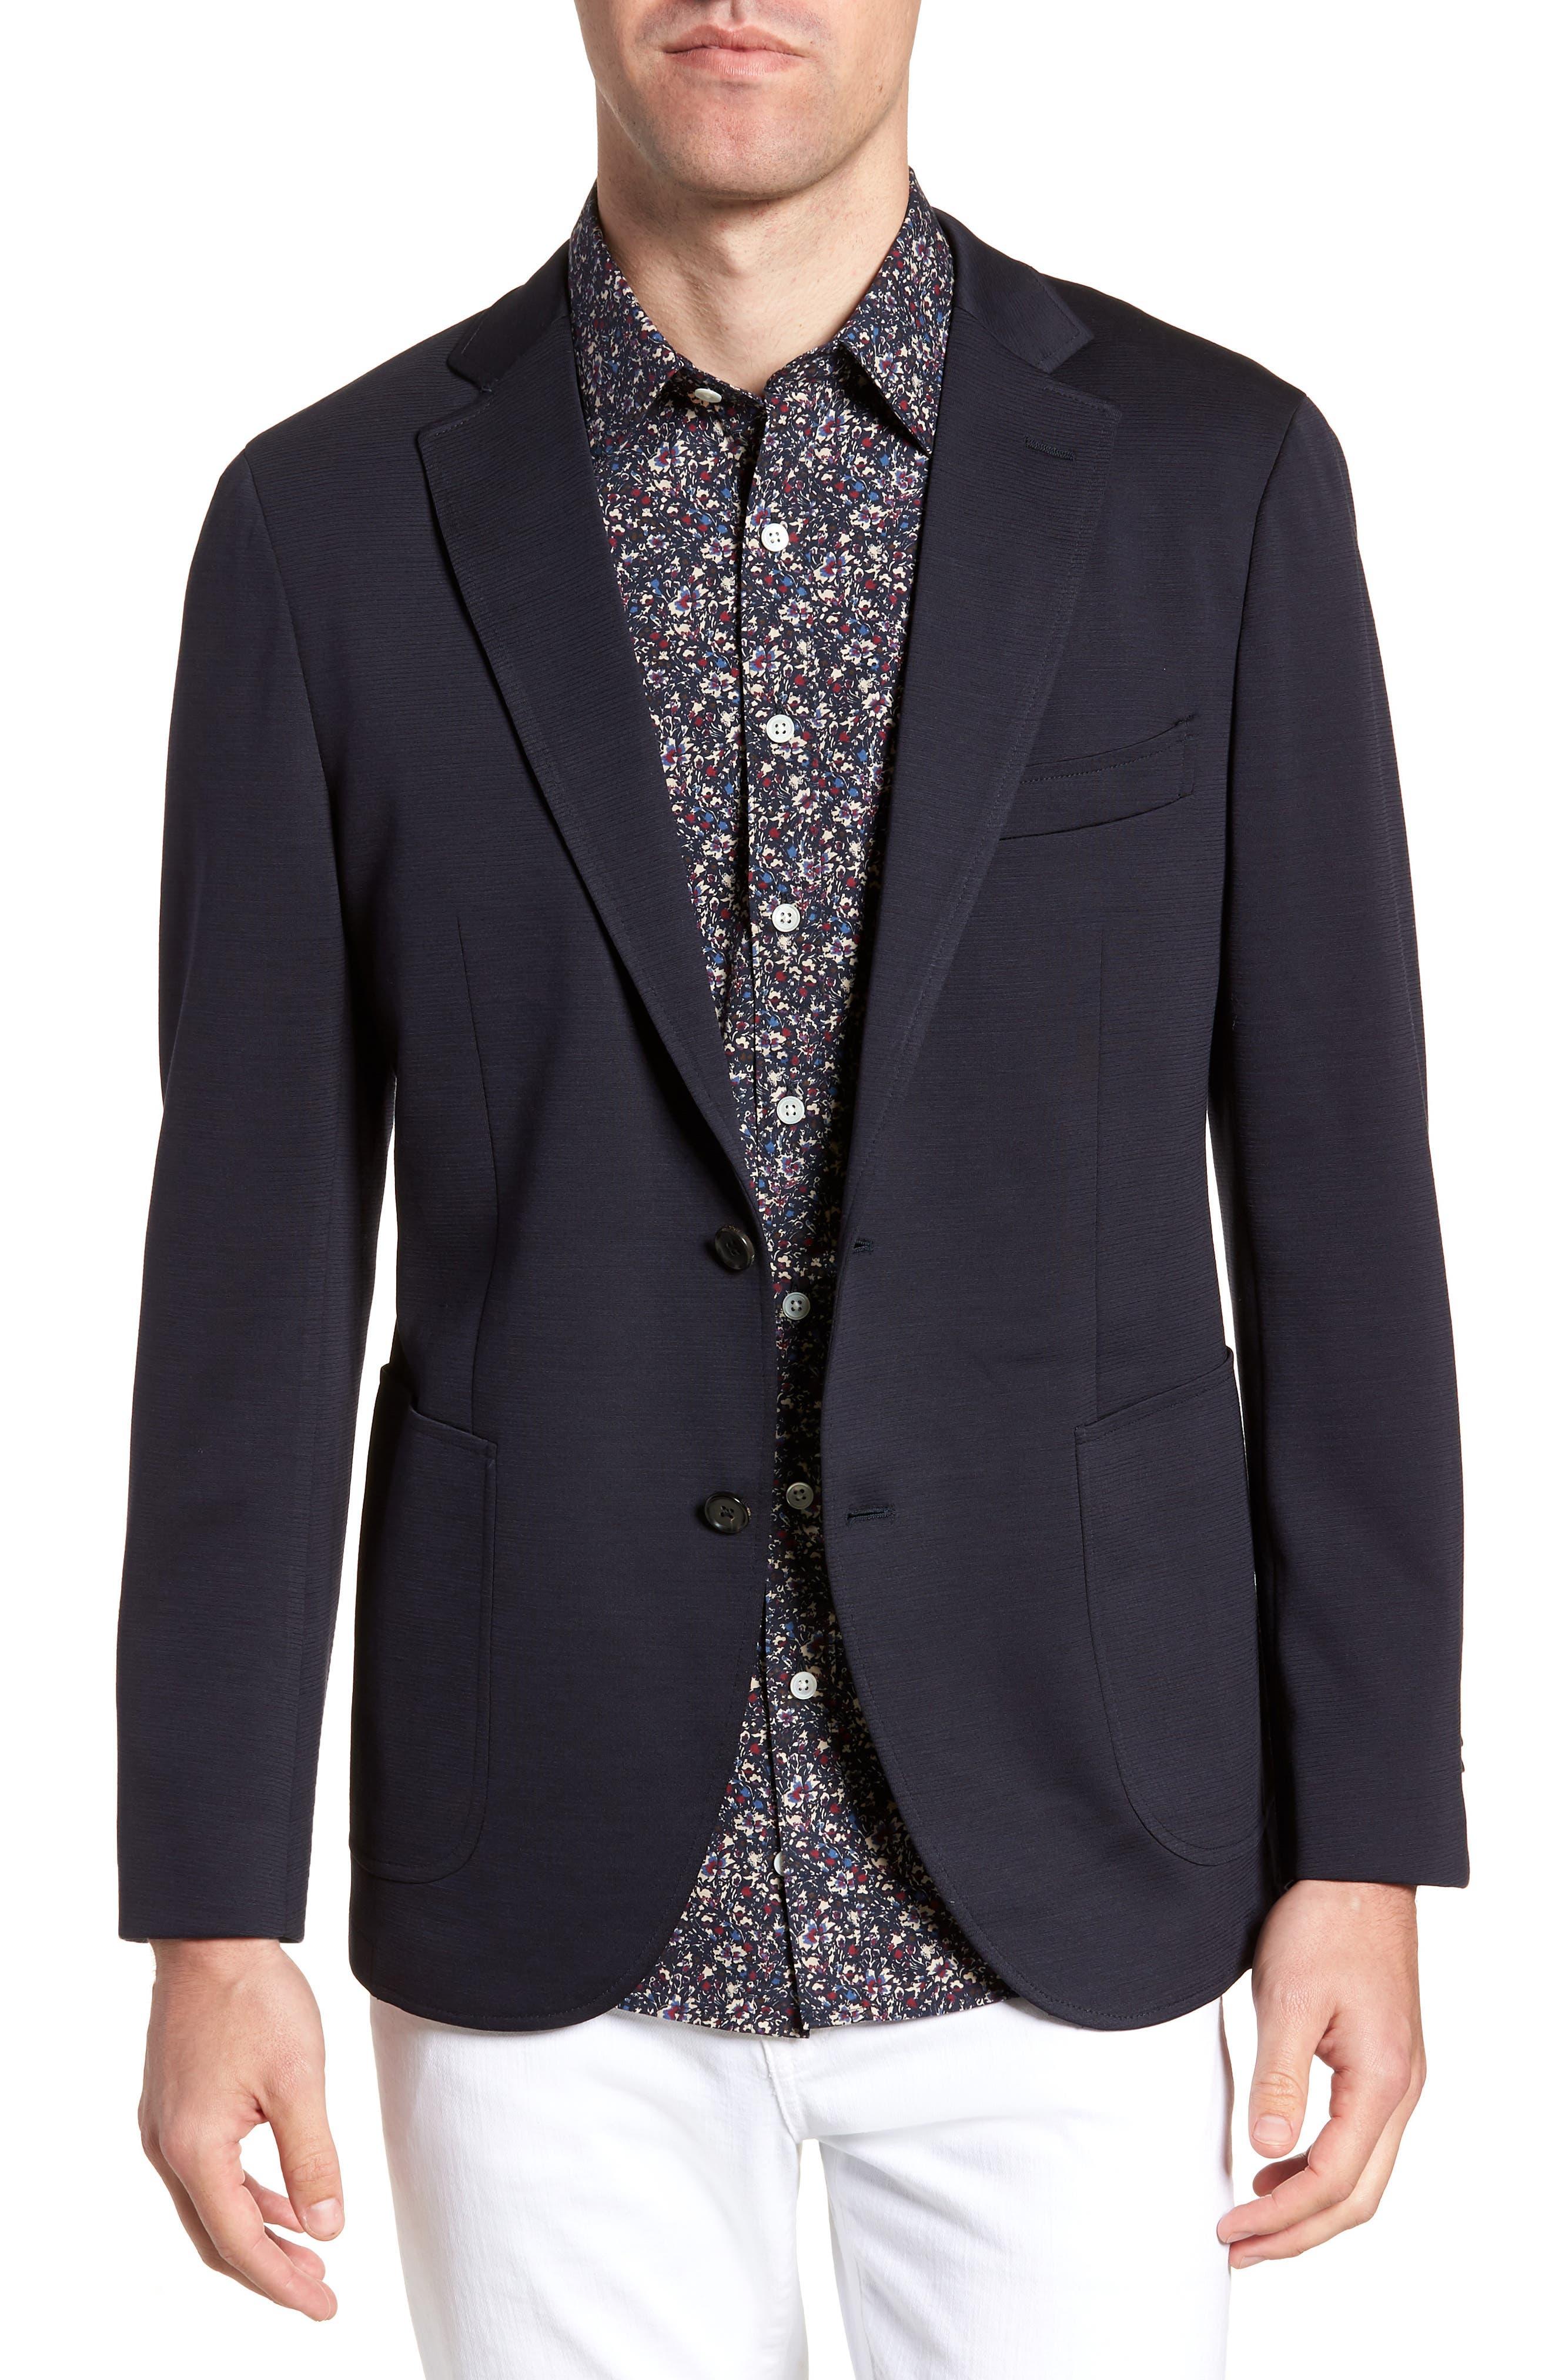 Cardrona Slim Fit Wool Blend Blazer,                         Main,                         color, 460